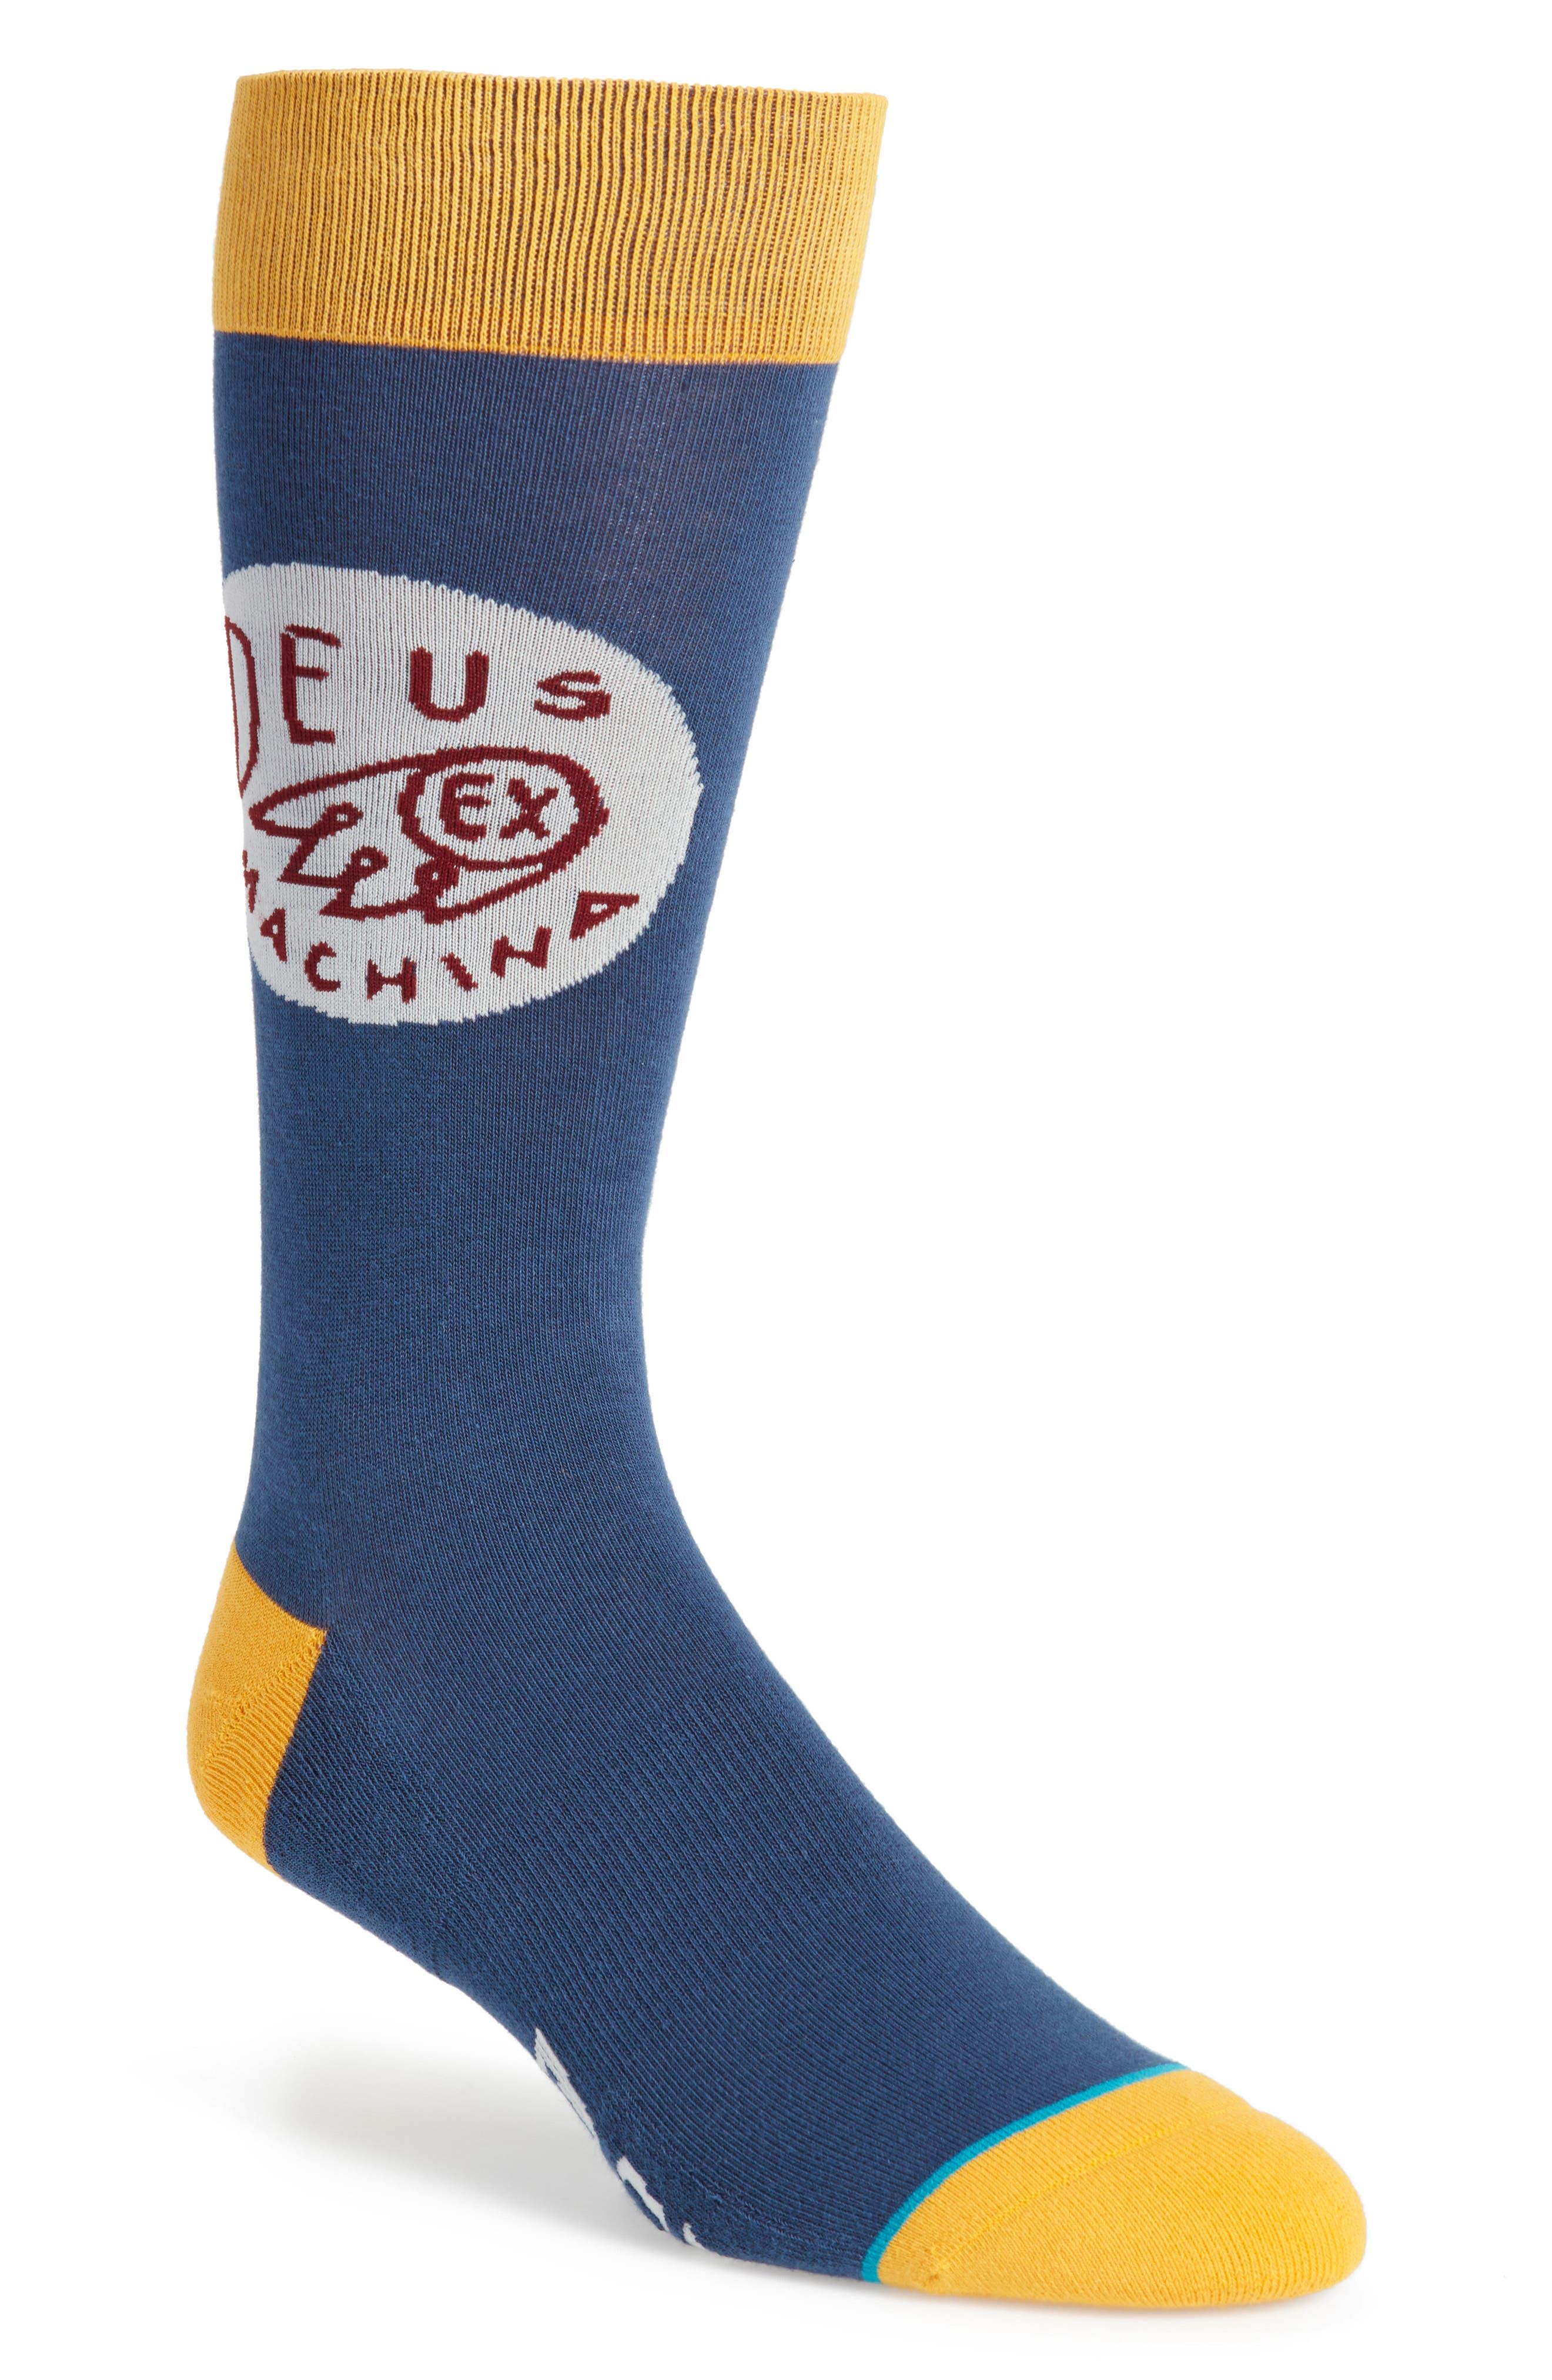 Main Image - Stance Hervey Crew Socks